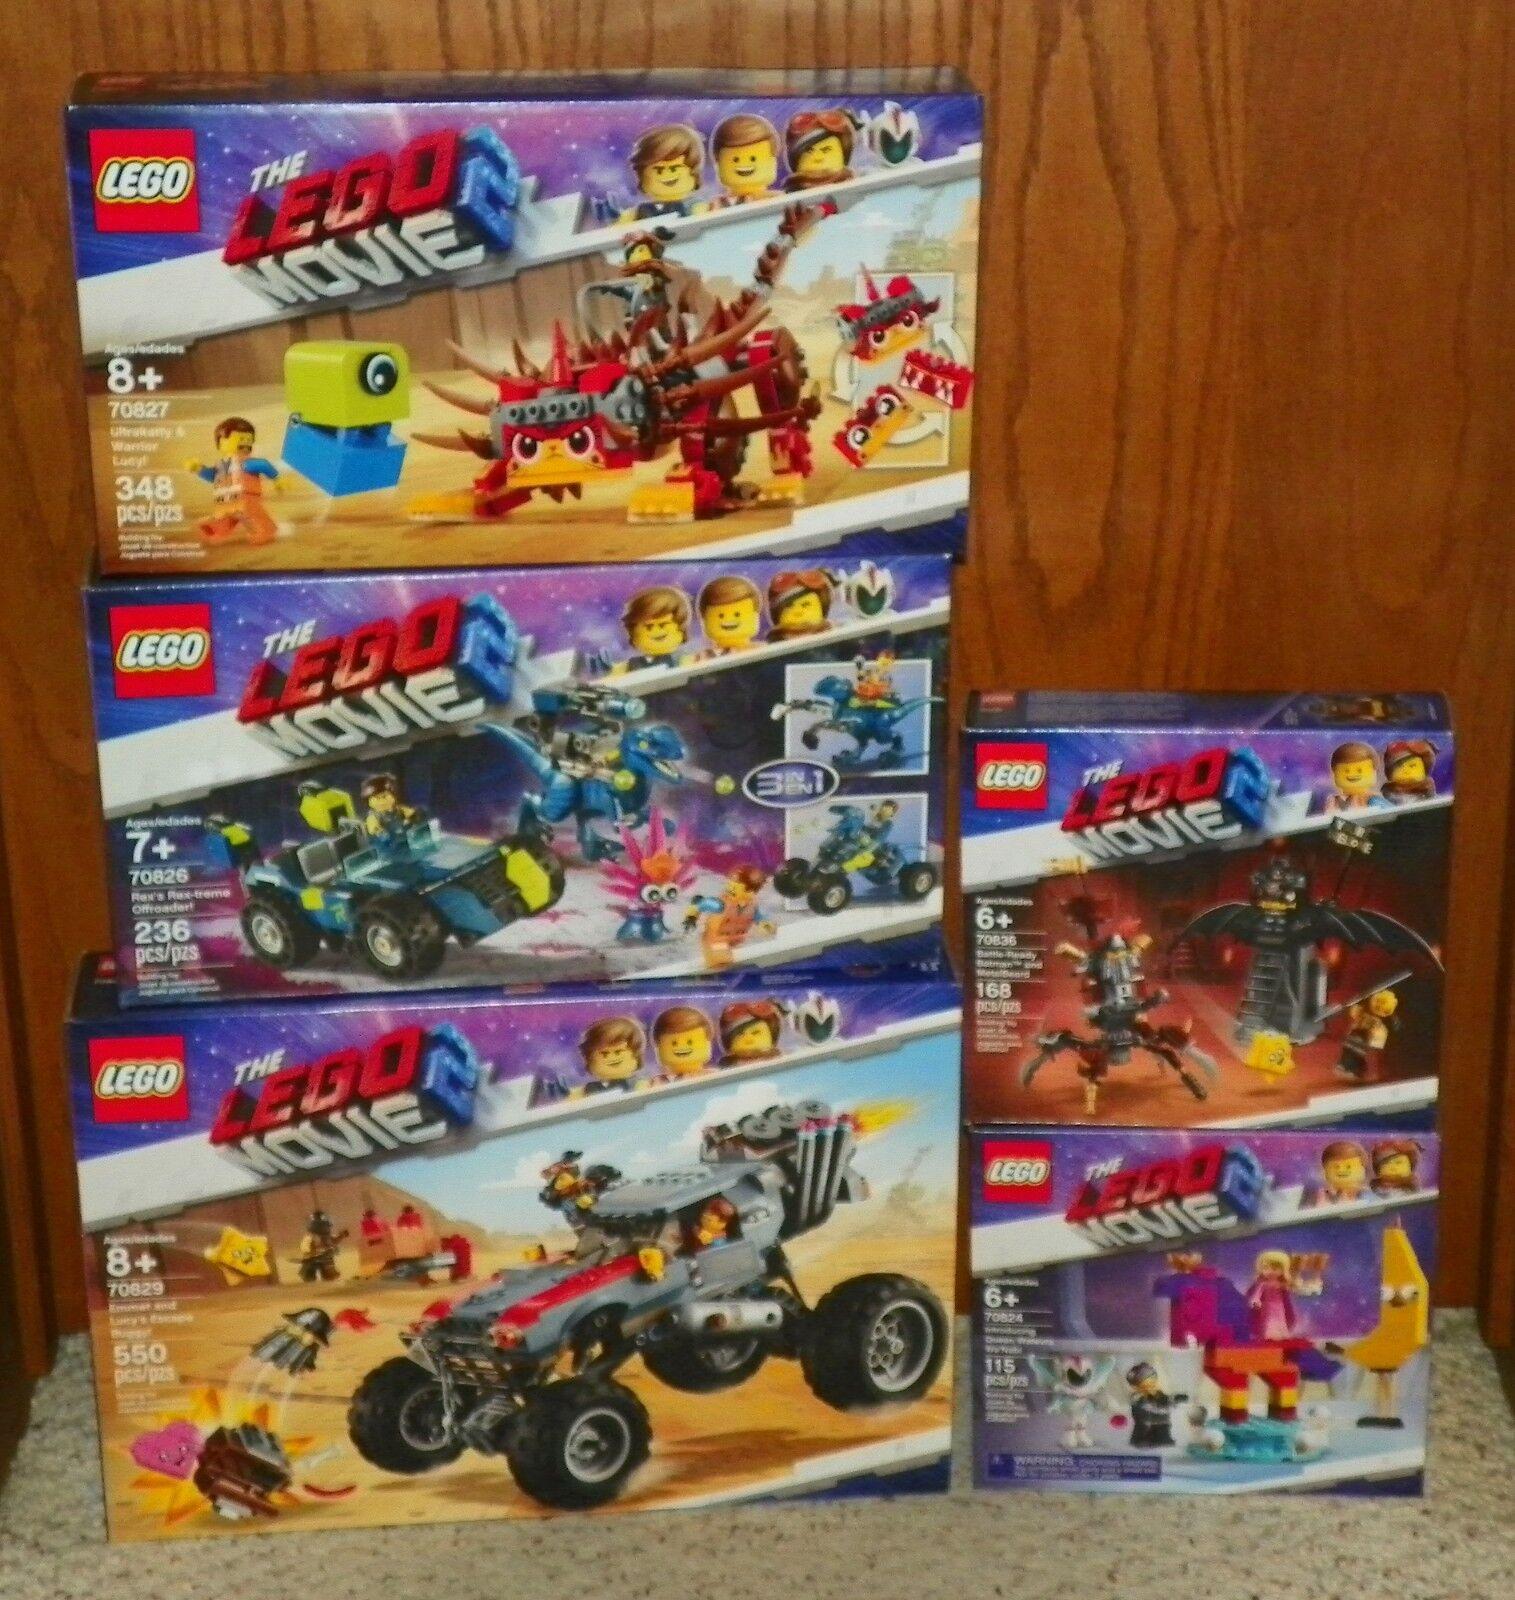 LEGO - The LEGO Movie 2 - 70829, 70827, 70826, 70836 & 70824 - 5 NEW SETS